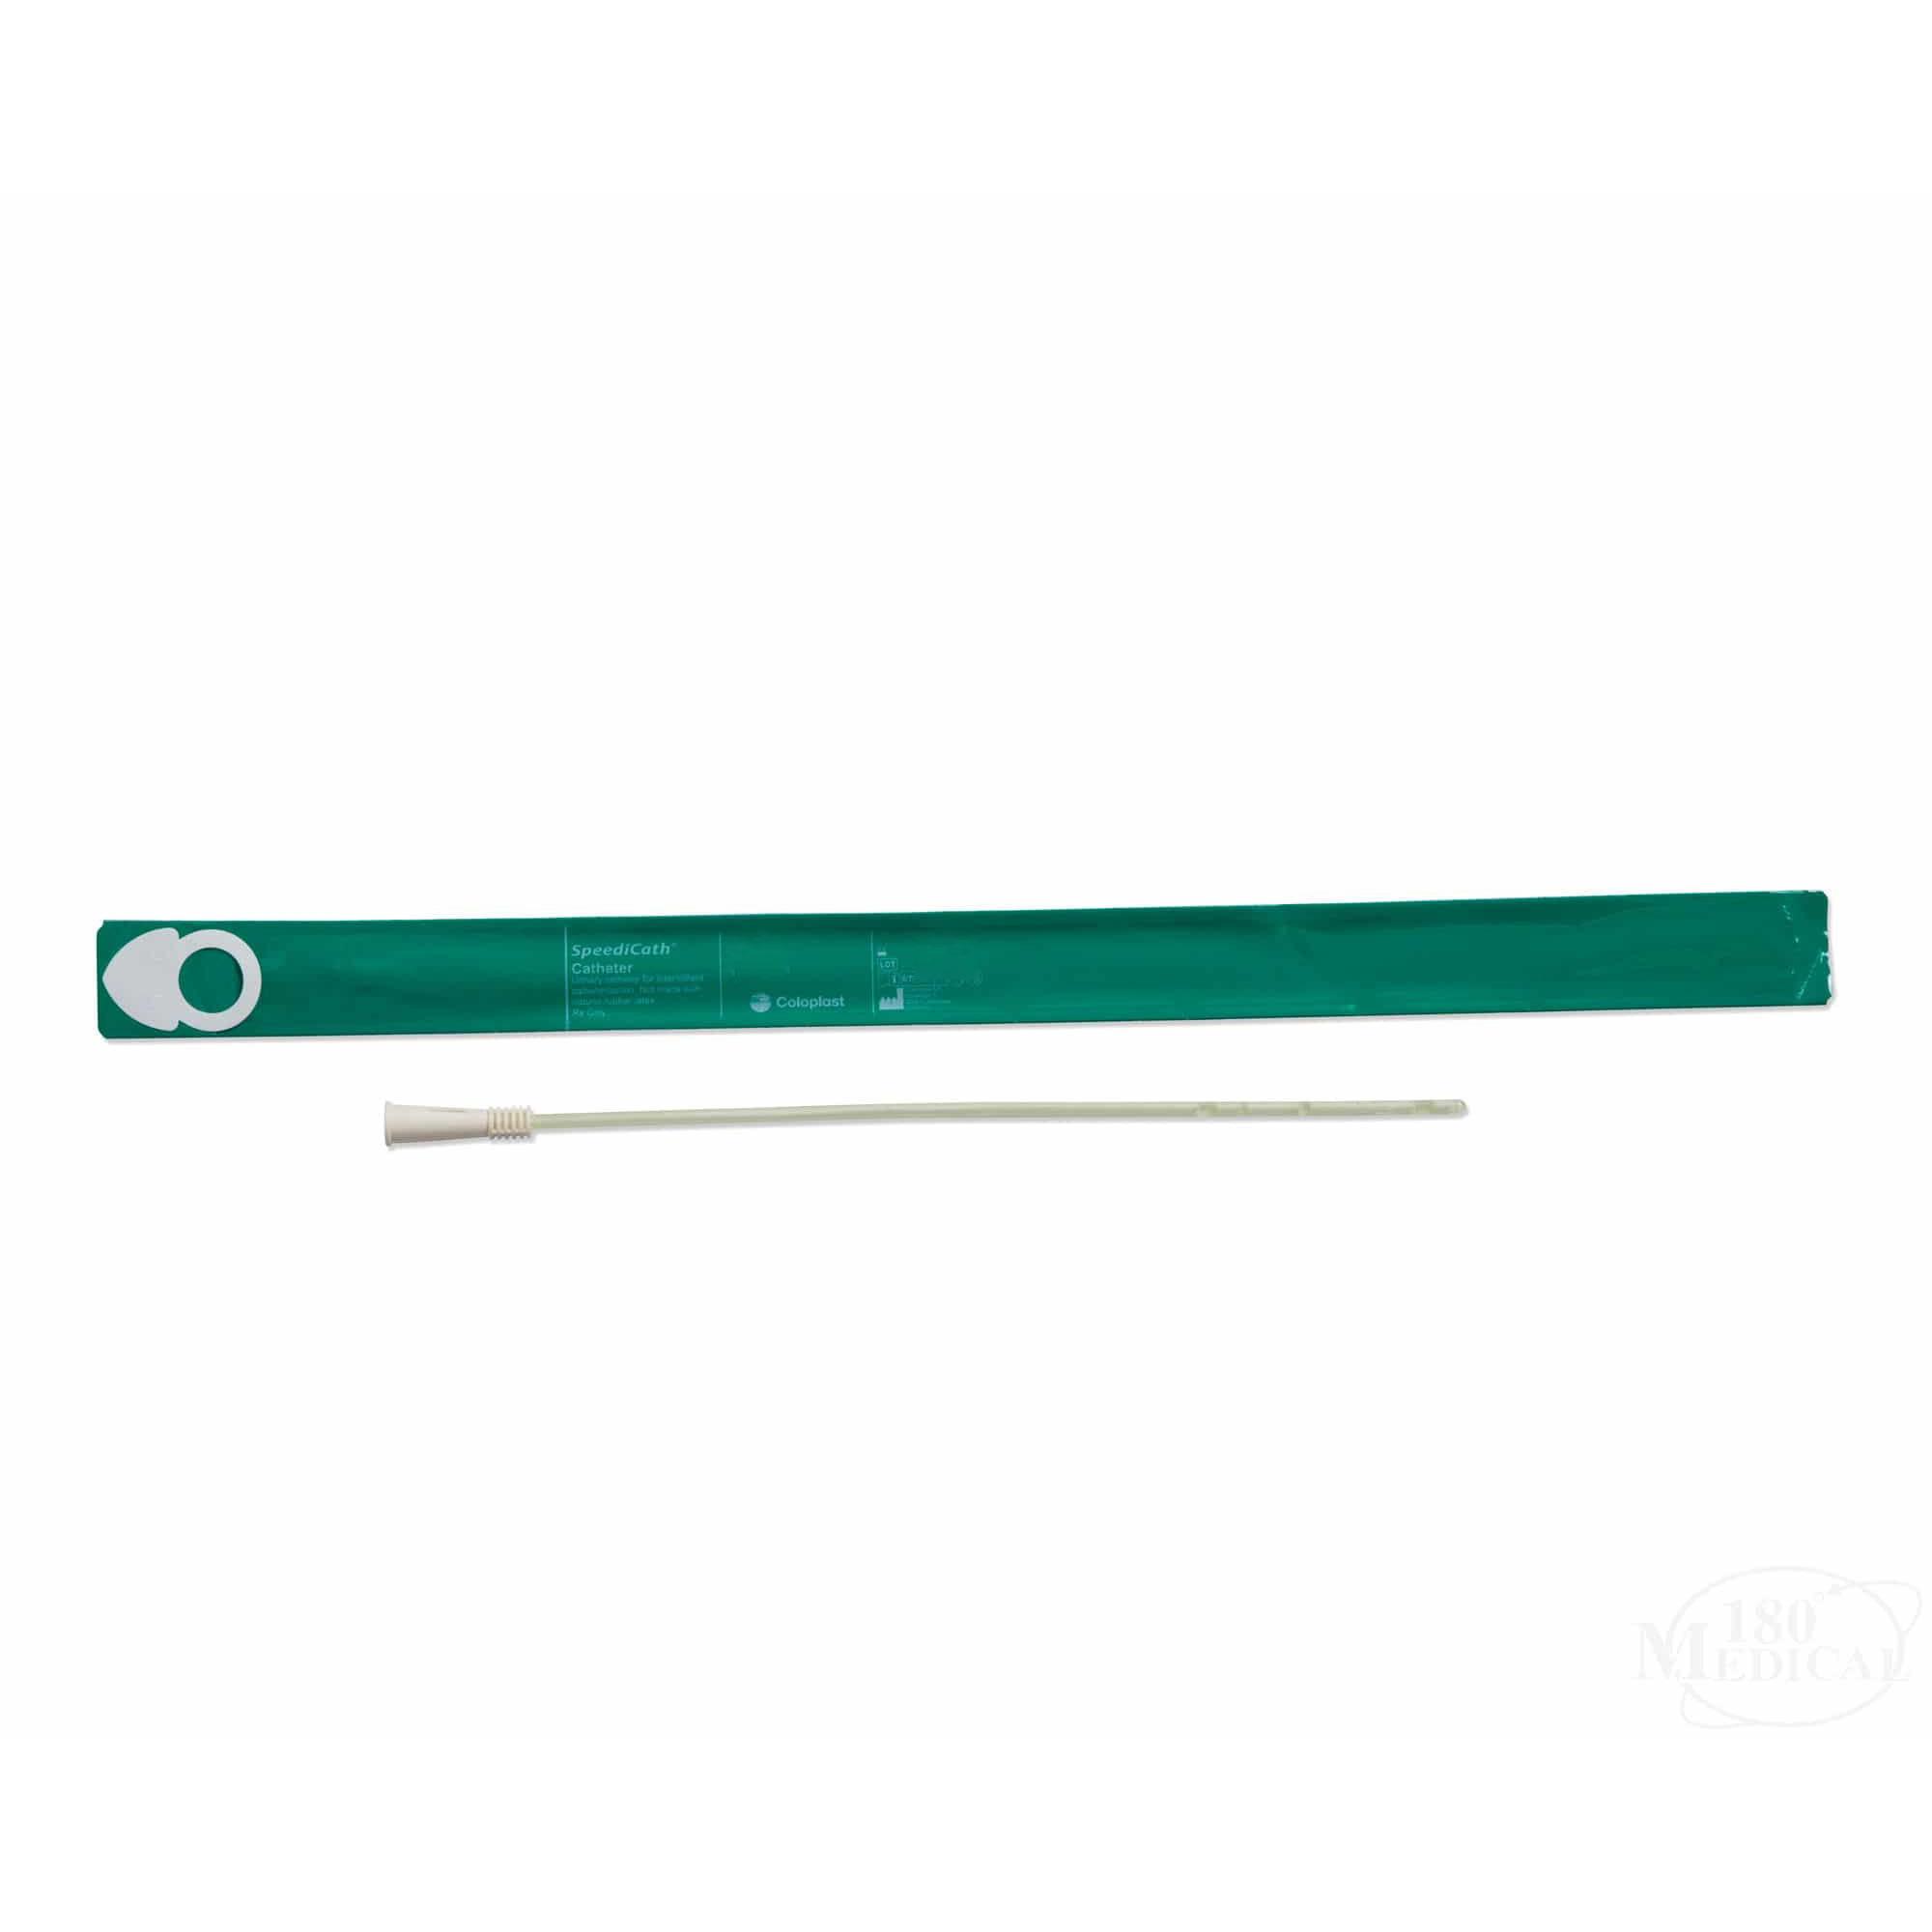 "Coloplast SpeediCath Pediatric Catheter,Straight,Hydrophilic Coating,Sterile,PVC, 8Fr, 6"" L"